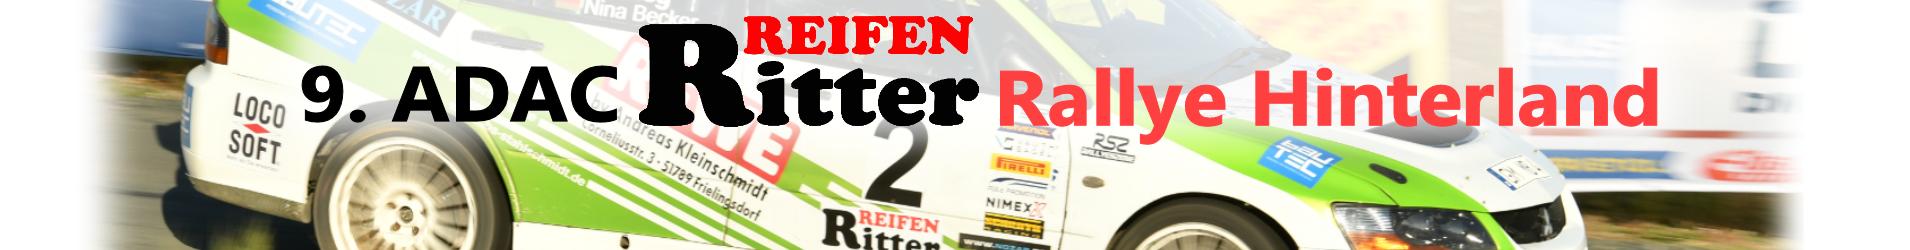 Rallye-Hinterland